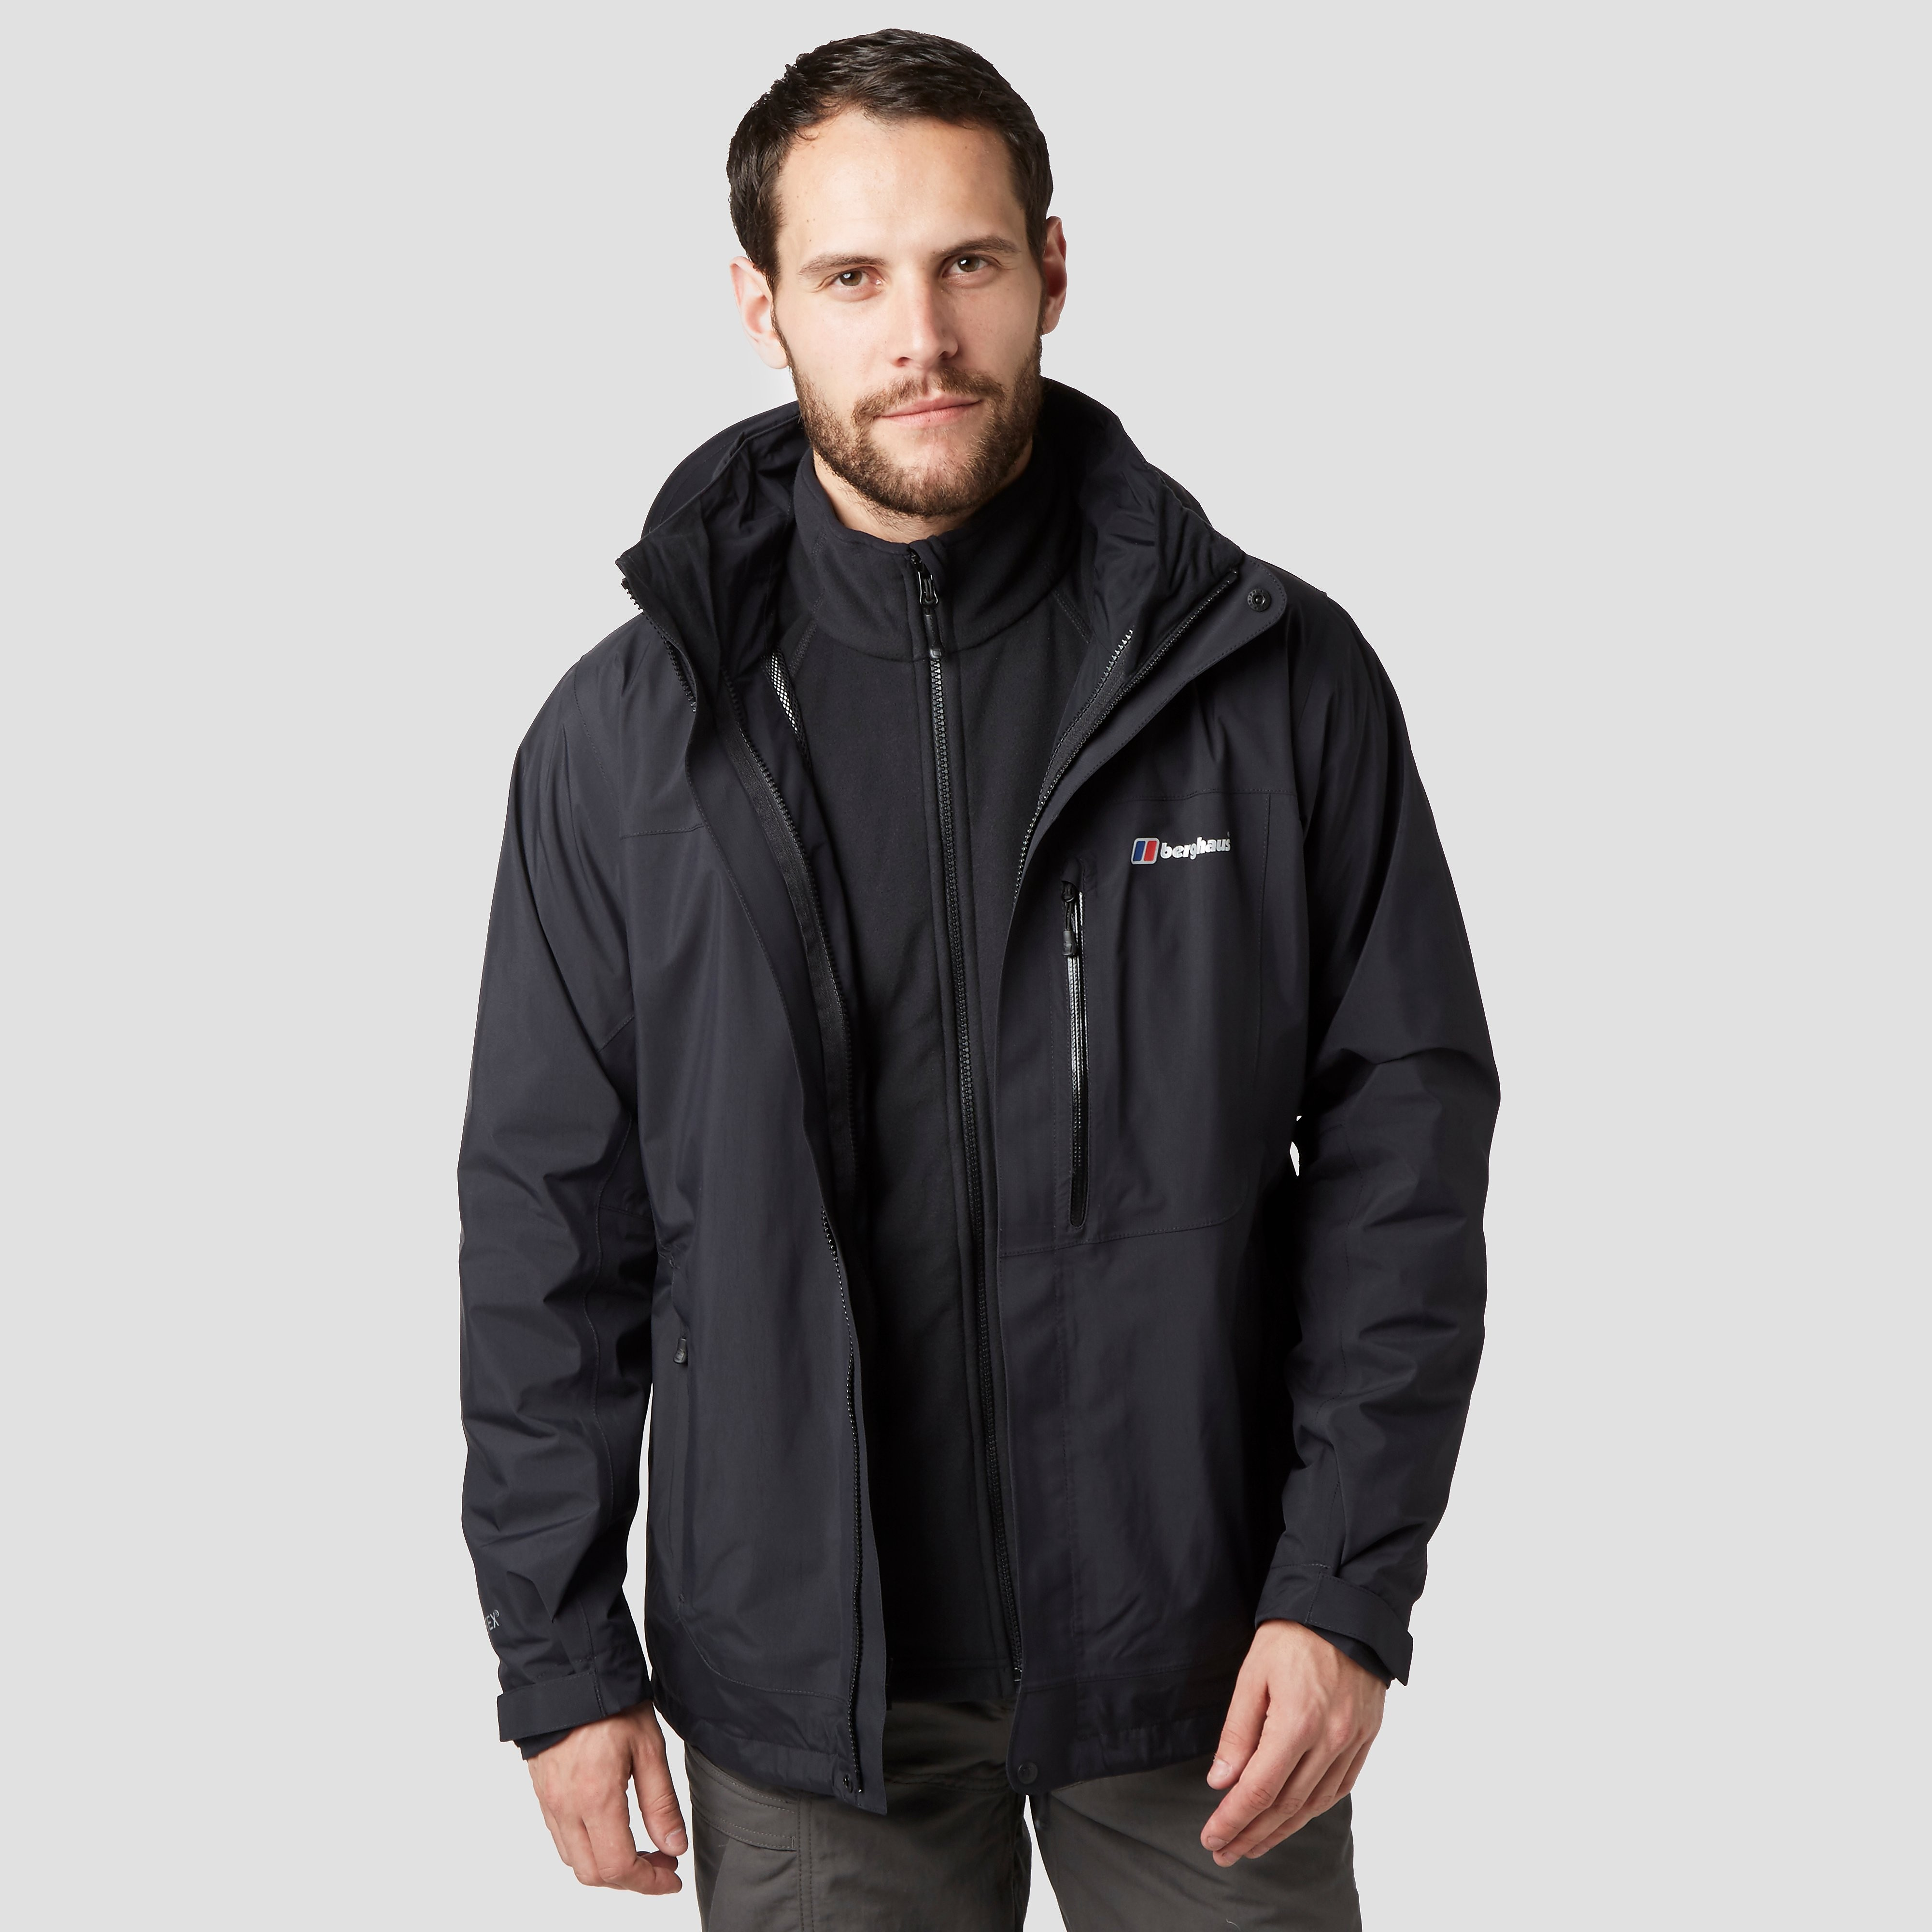 Berghaus Men's Arisdale 3 in 1 GORE-TEX Jacket